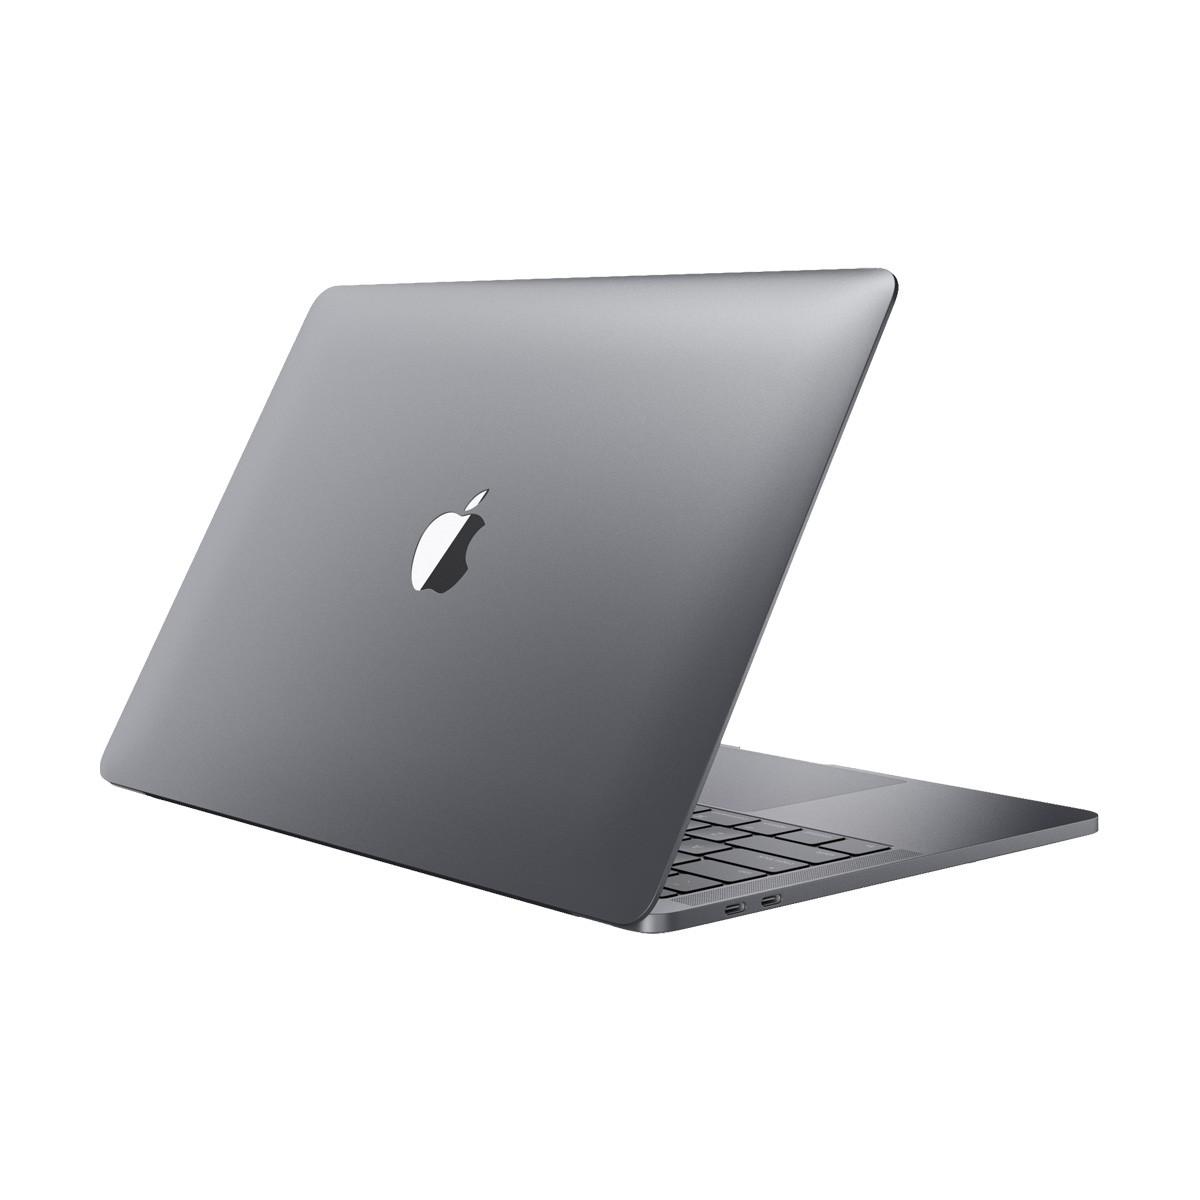 Buy Apple MacBook Pro 13 3inch, 2 3Ghz, intel Core i5, 8GB Ram, 128GB SSD,  Retina Display, Space Gray, Newest Edition/MPXQ2LL/A Online   Get Free